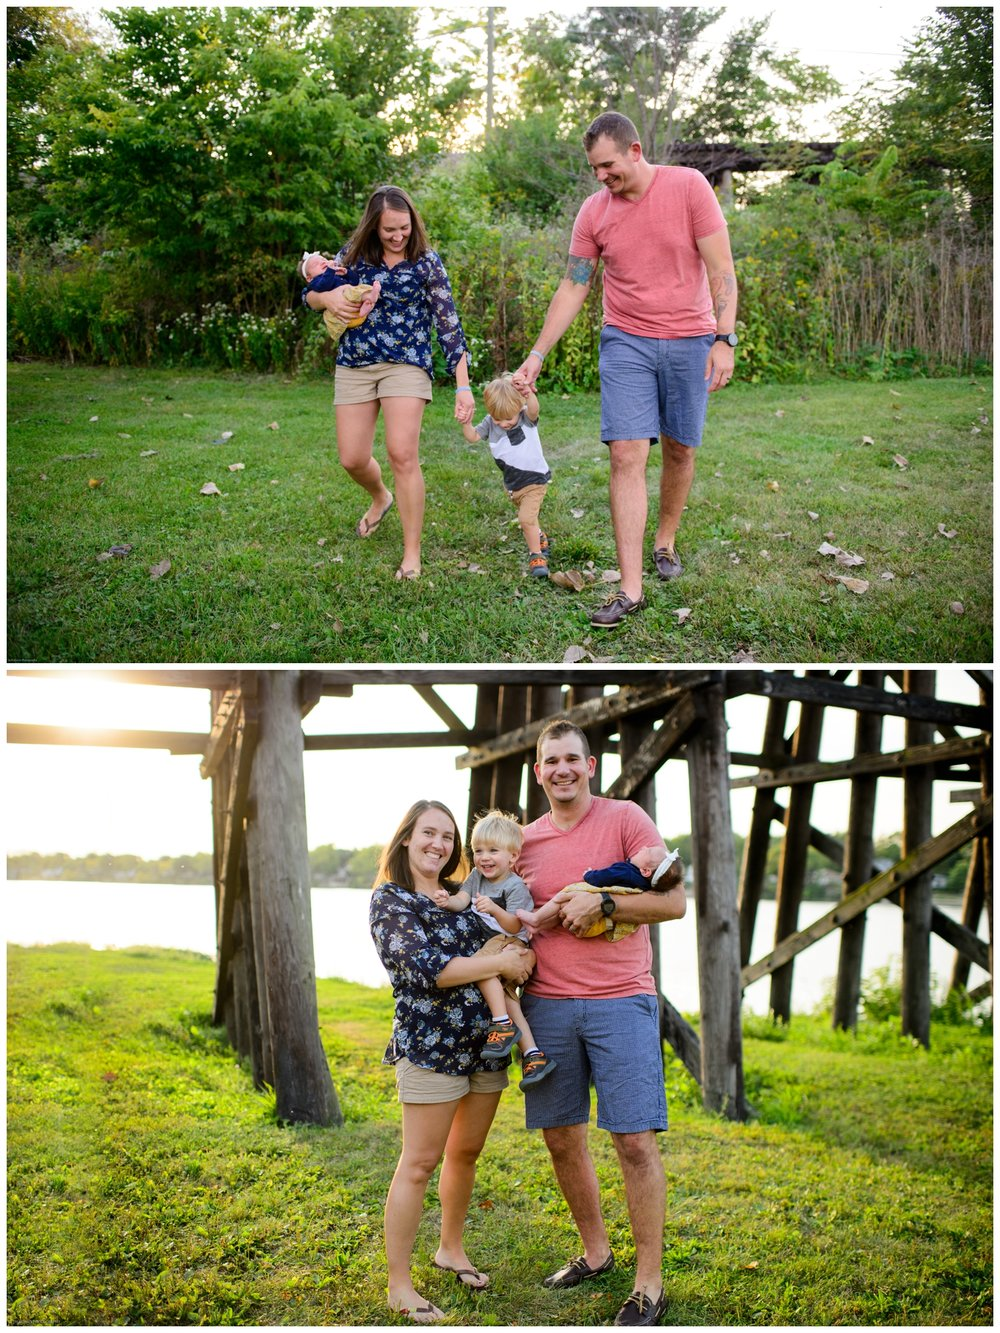 cittafamily-86.jpg